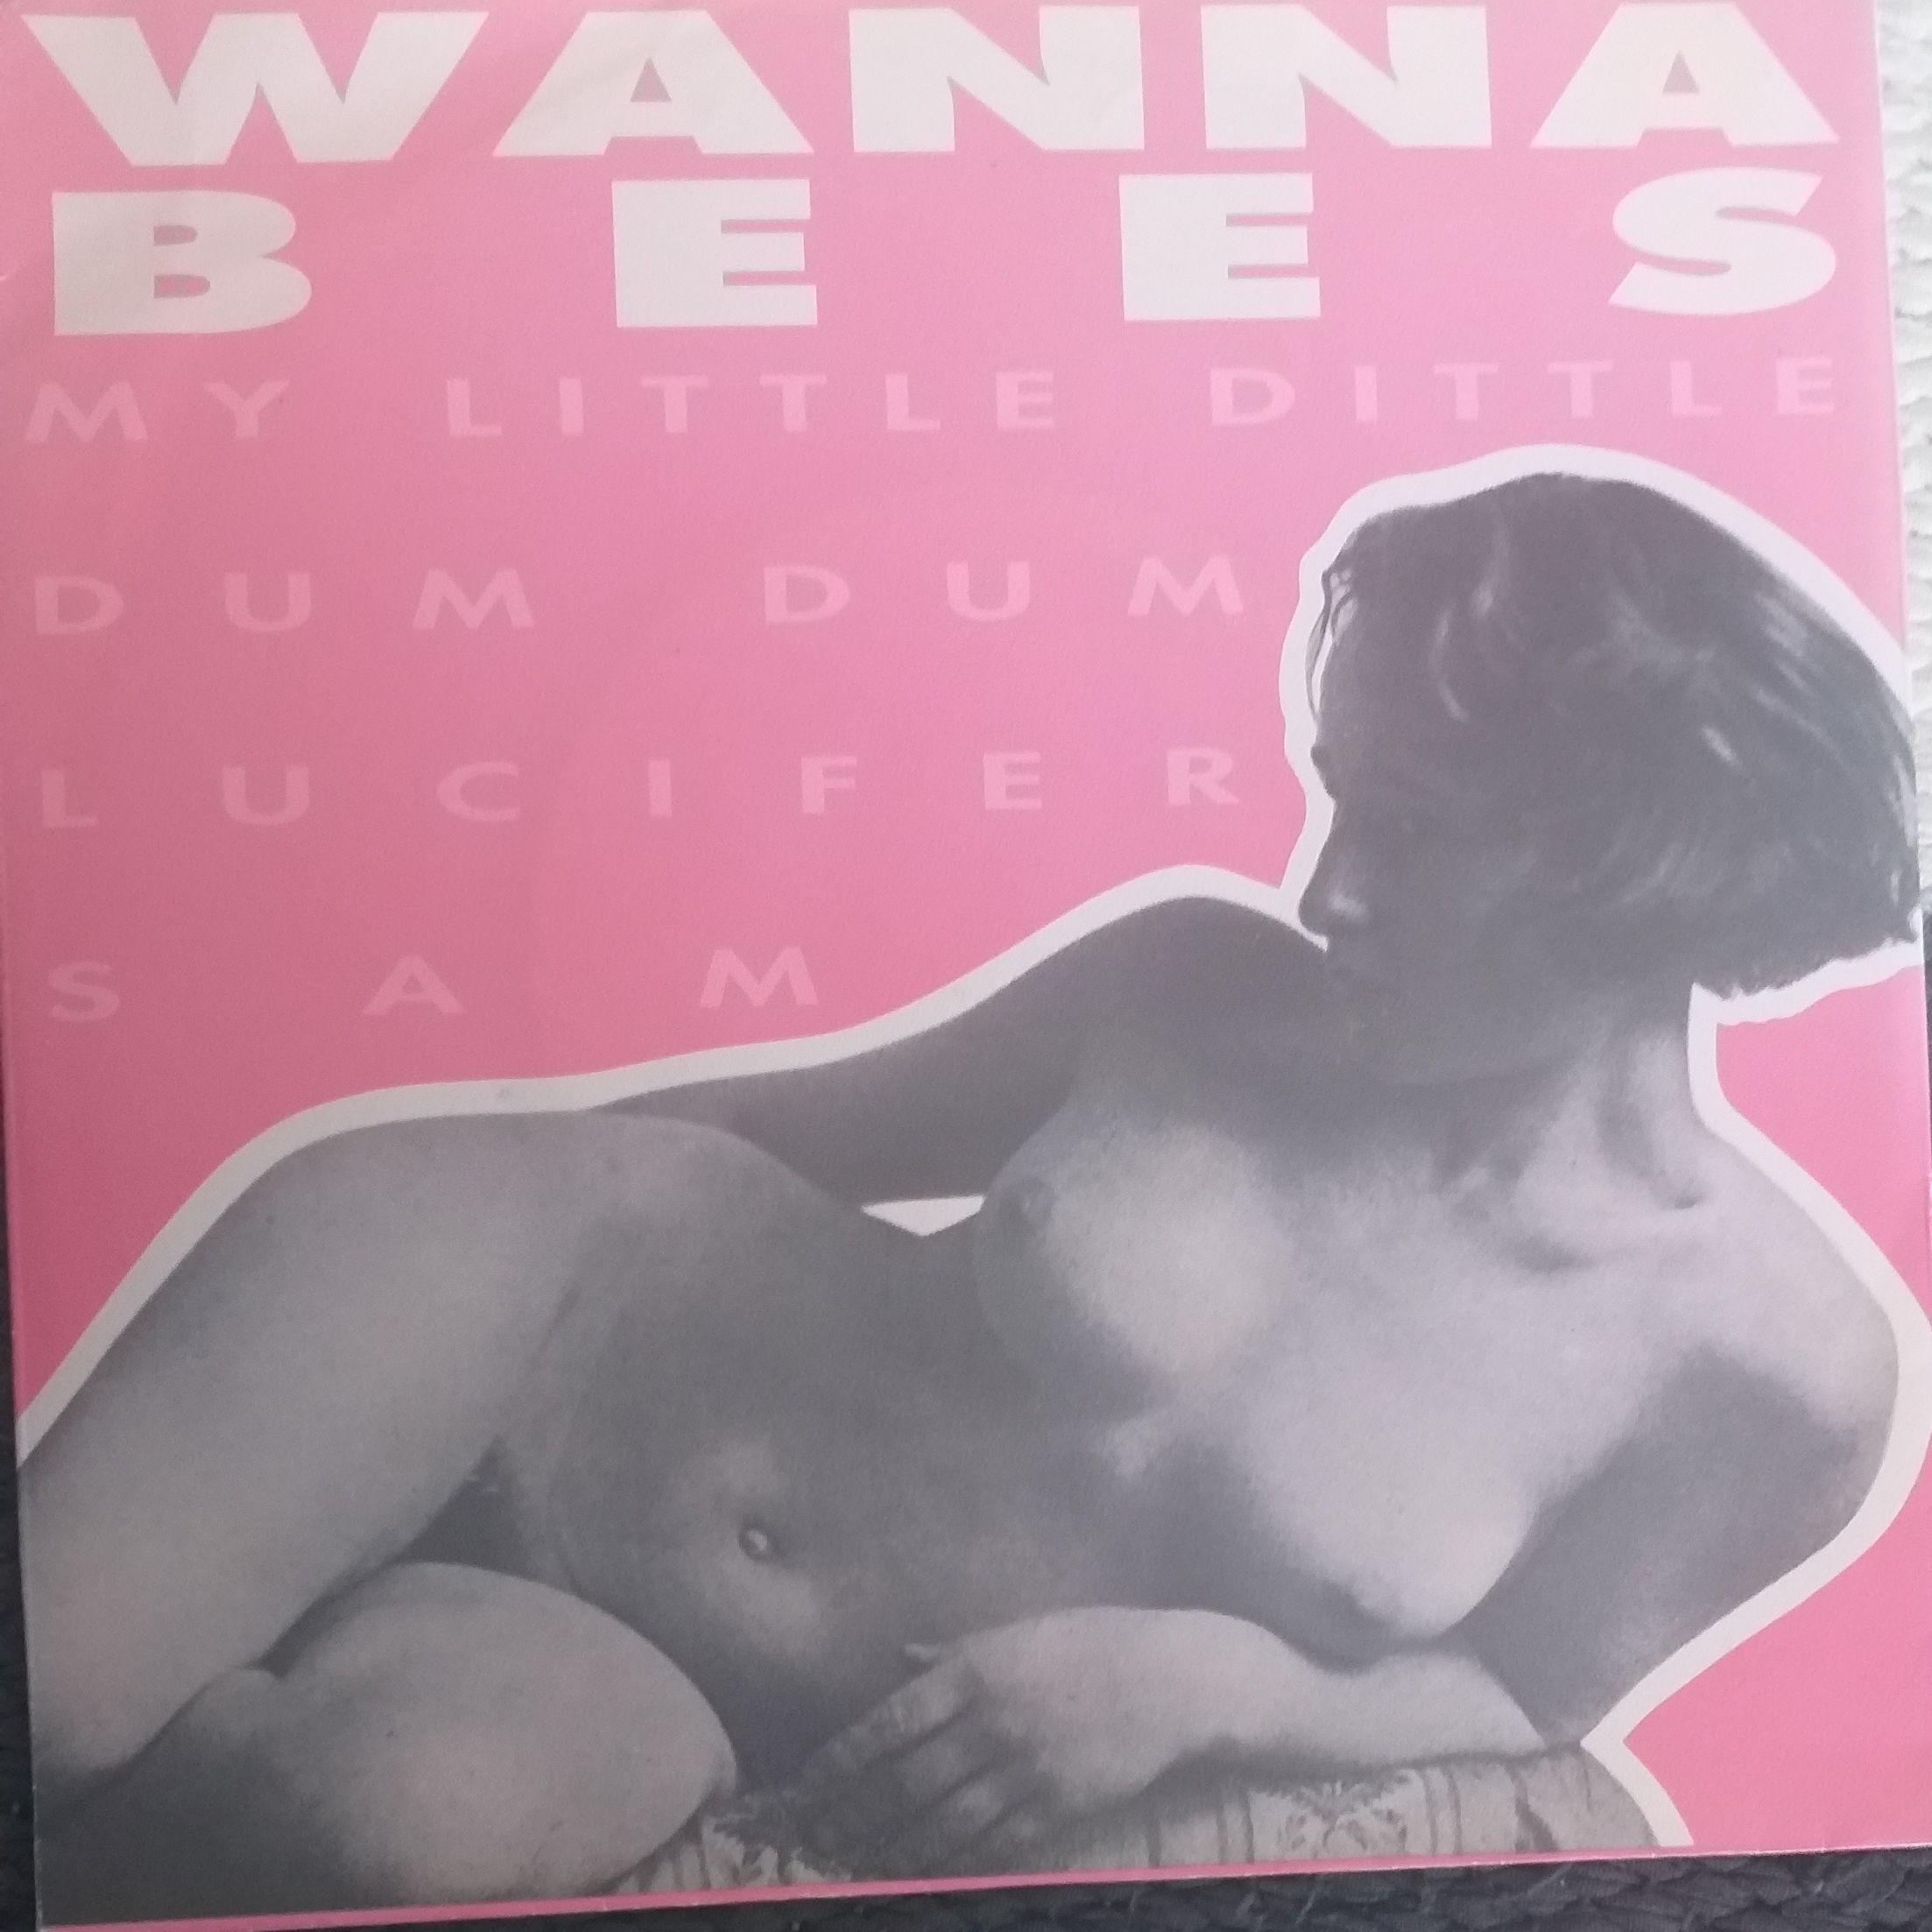 Wanna bees My little dittle dum LP undefined